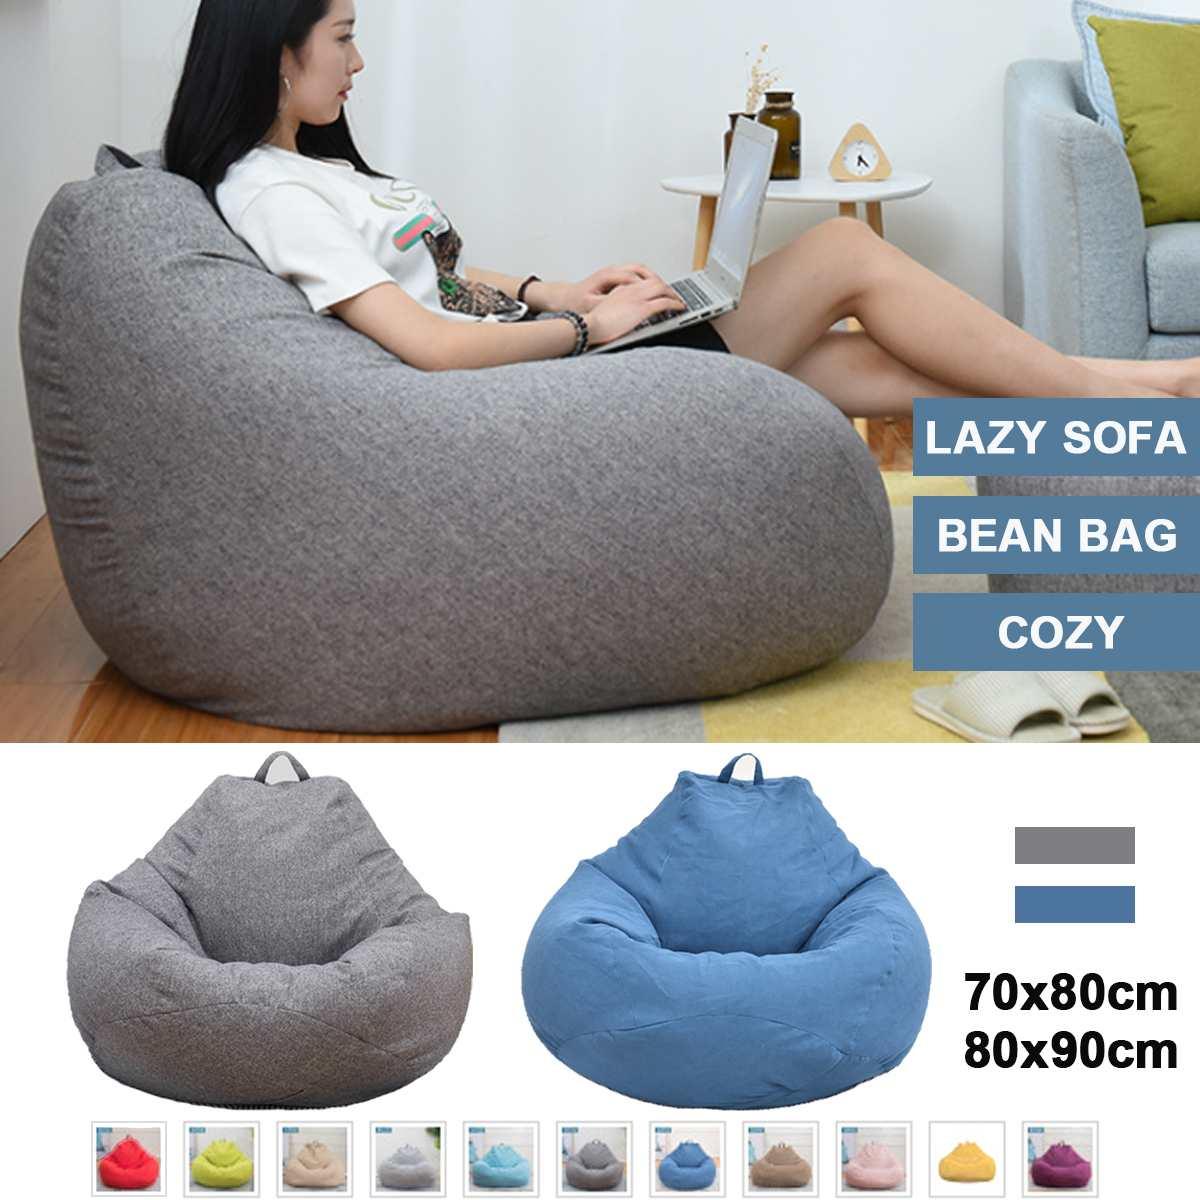 Relleno Animal para muebles, bolsa otomana para asiento, sin relleno, bolsa de Beanbag, sofás, tumbona, sofá, funda de algodón para silla, solo cubierta